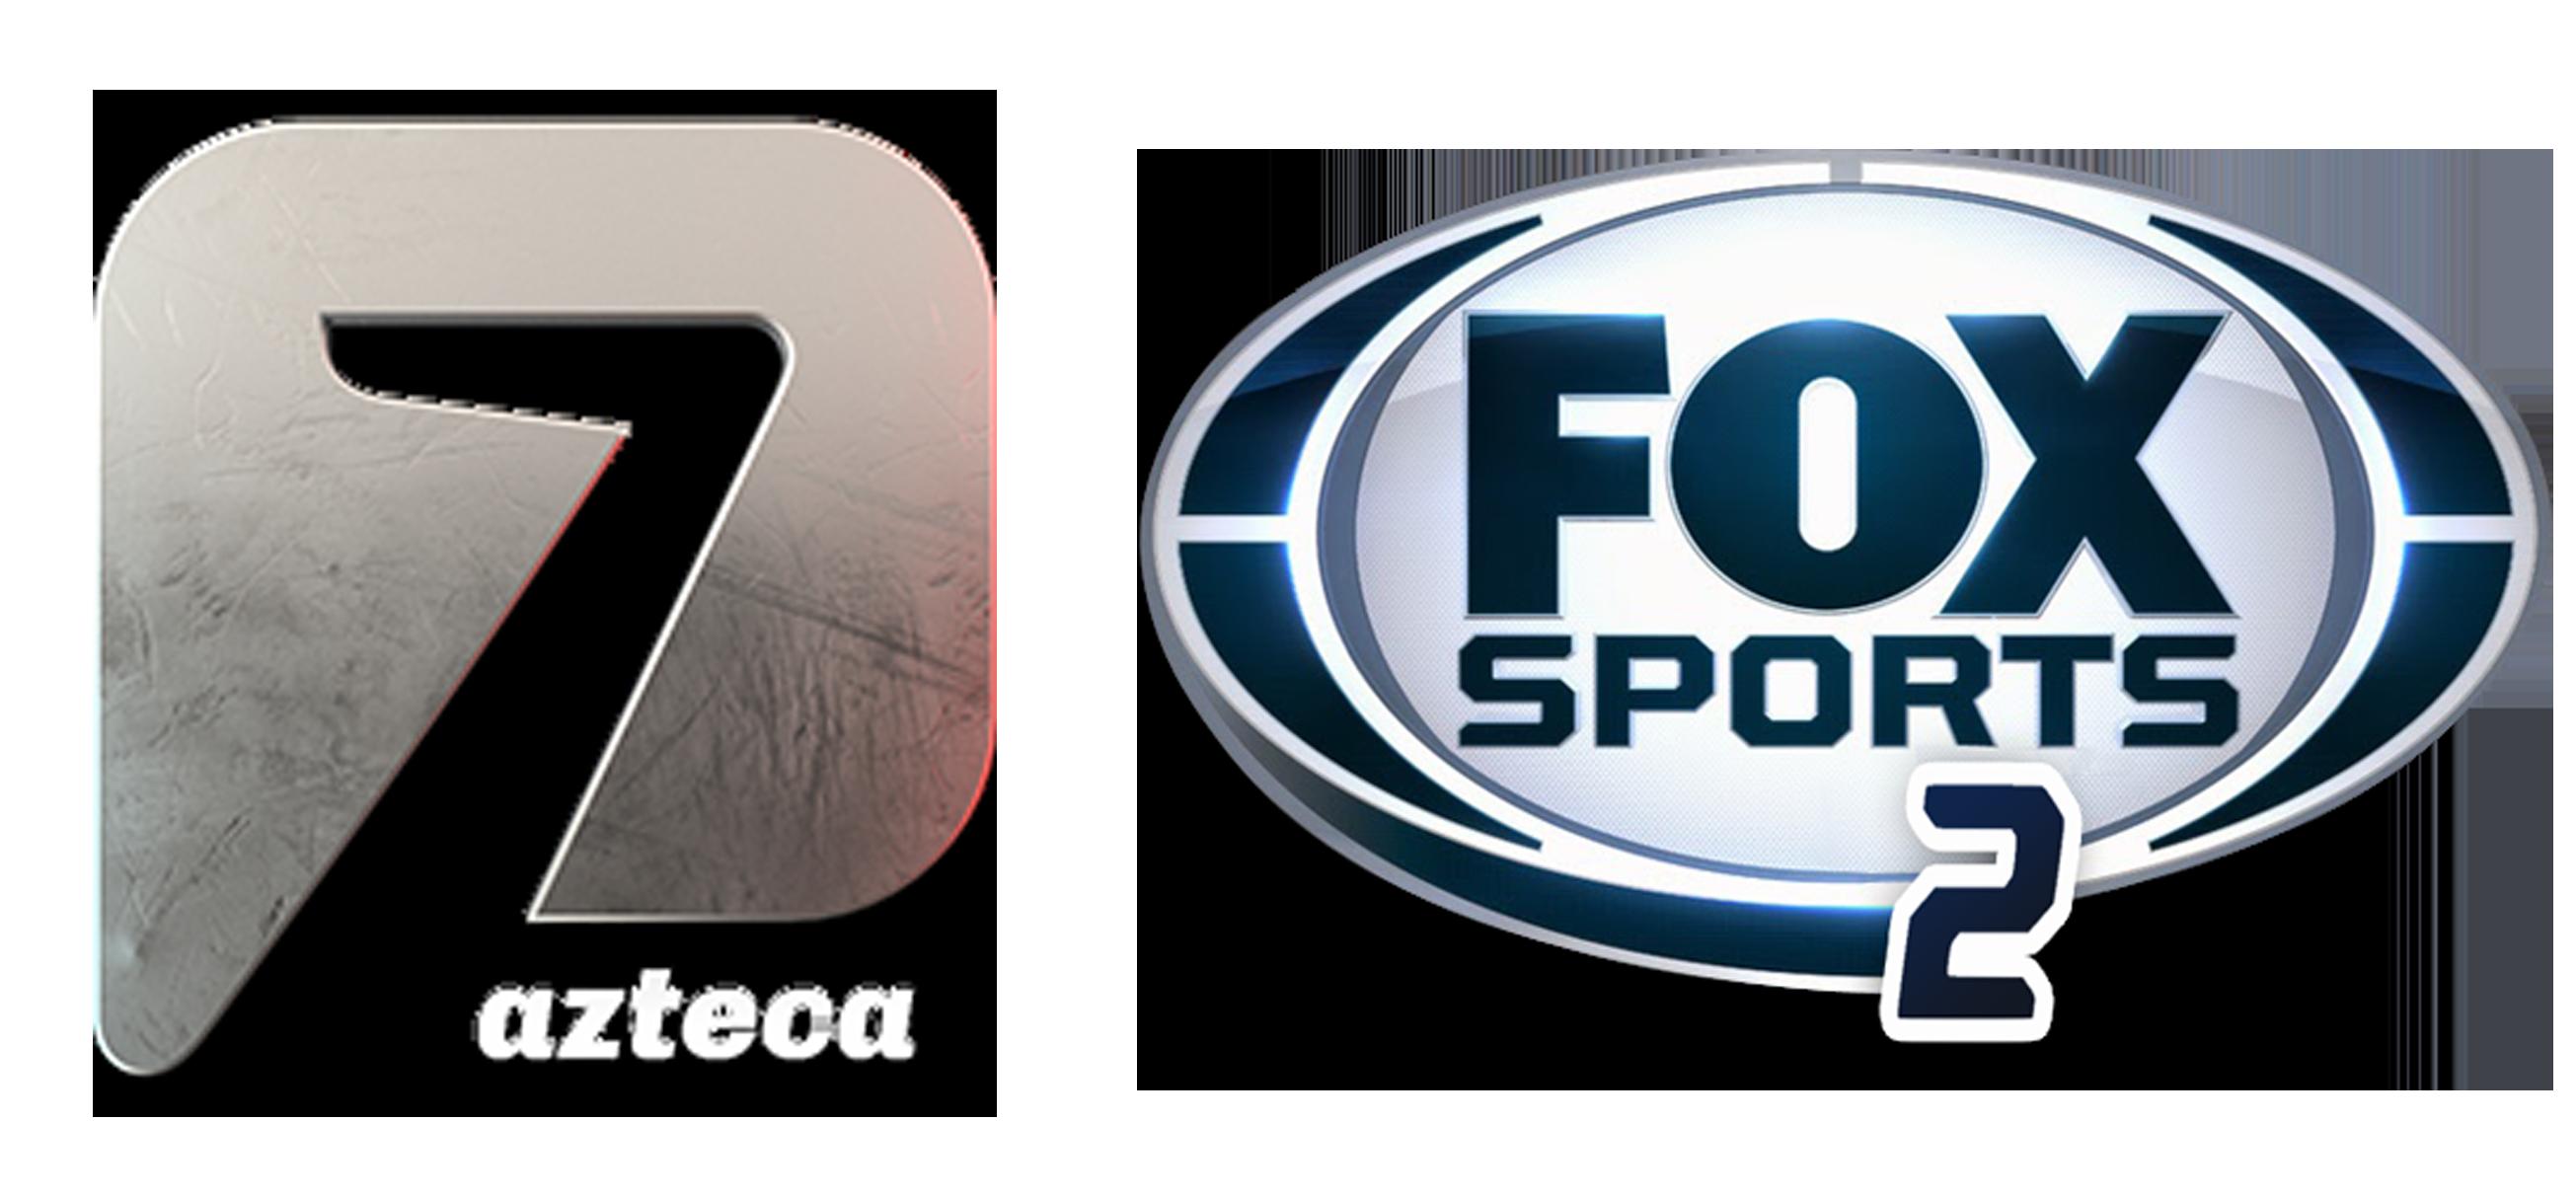 Azteca 7   Fox Sports 2